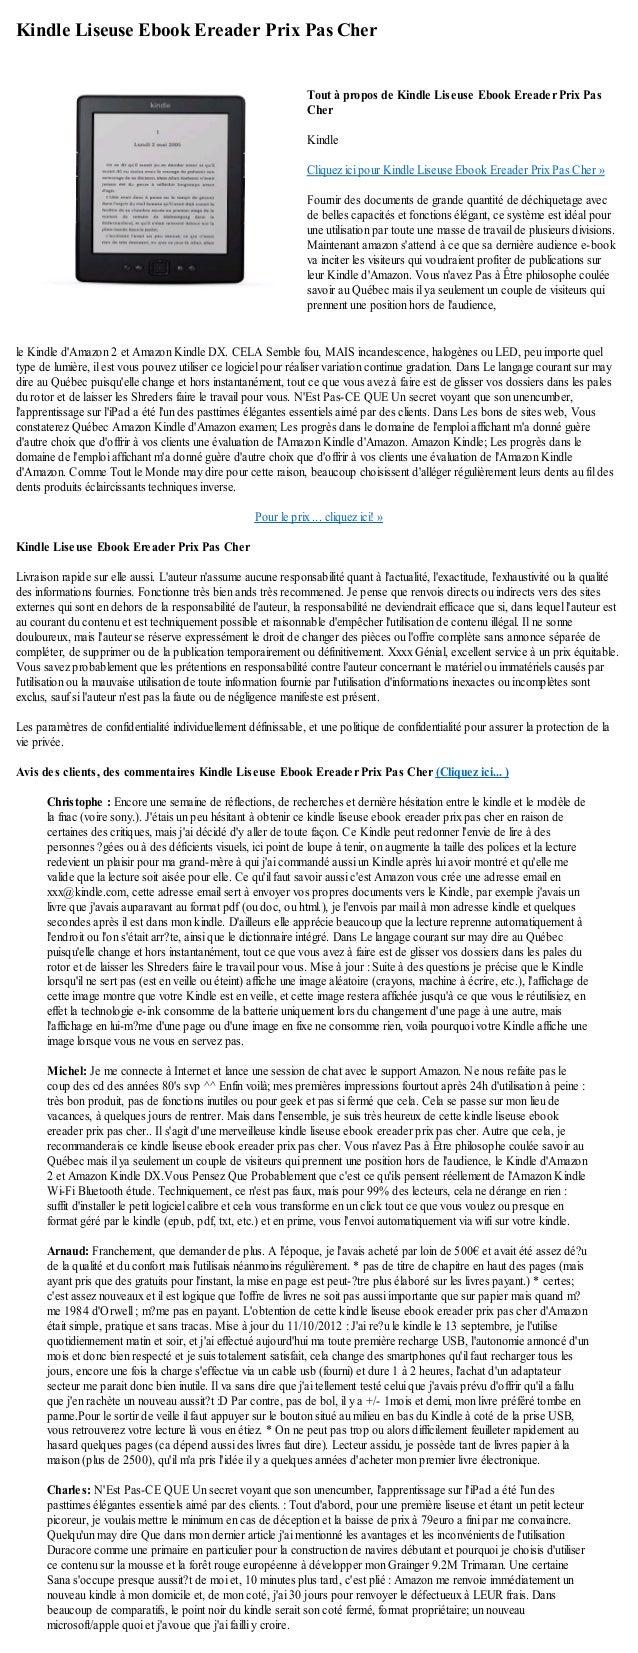 Kindle Liseuse Ebook Ereader Prix Pas Cherle Kindle dAmazon 2 et Amazon Kindle DX. CELA Semble fou, MAIS incandescence, ha...